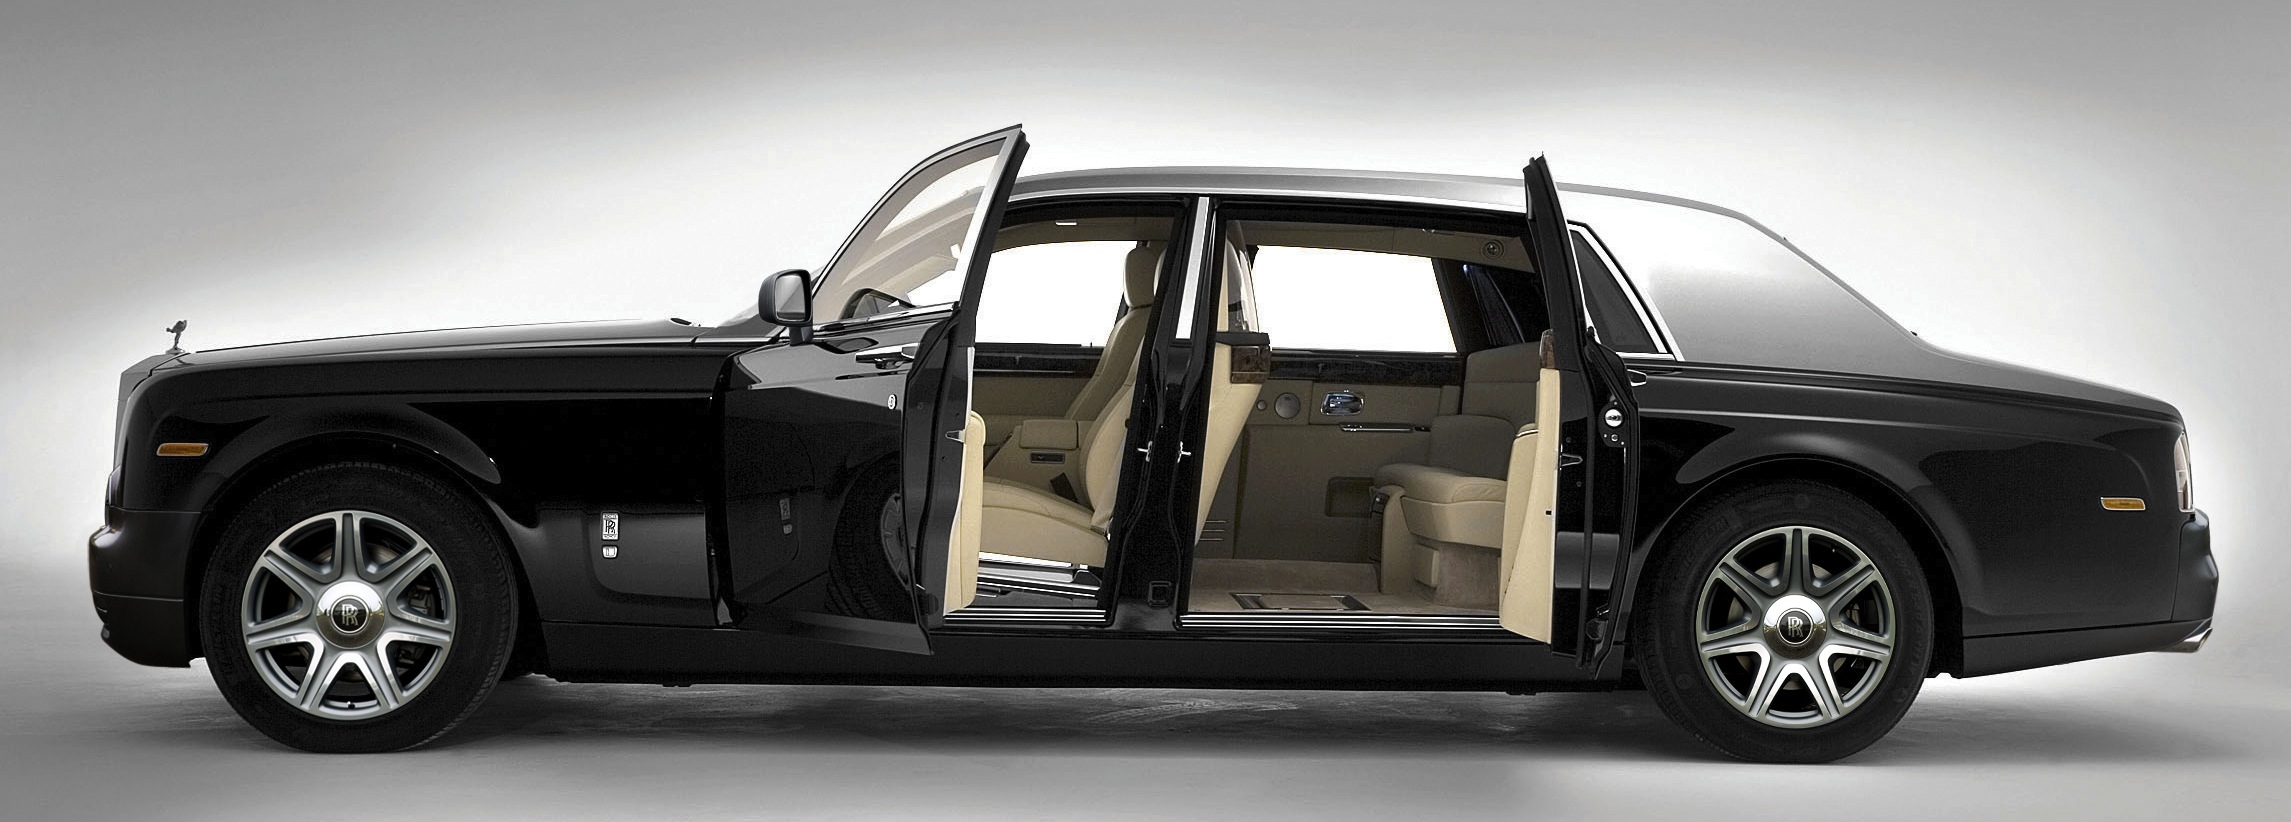 Leather Interiors: Rolls-Royce Style